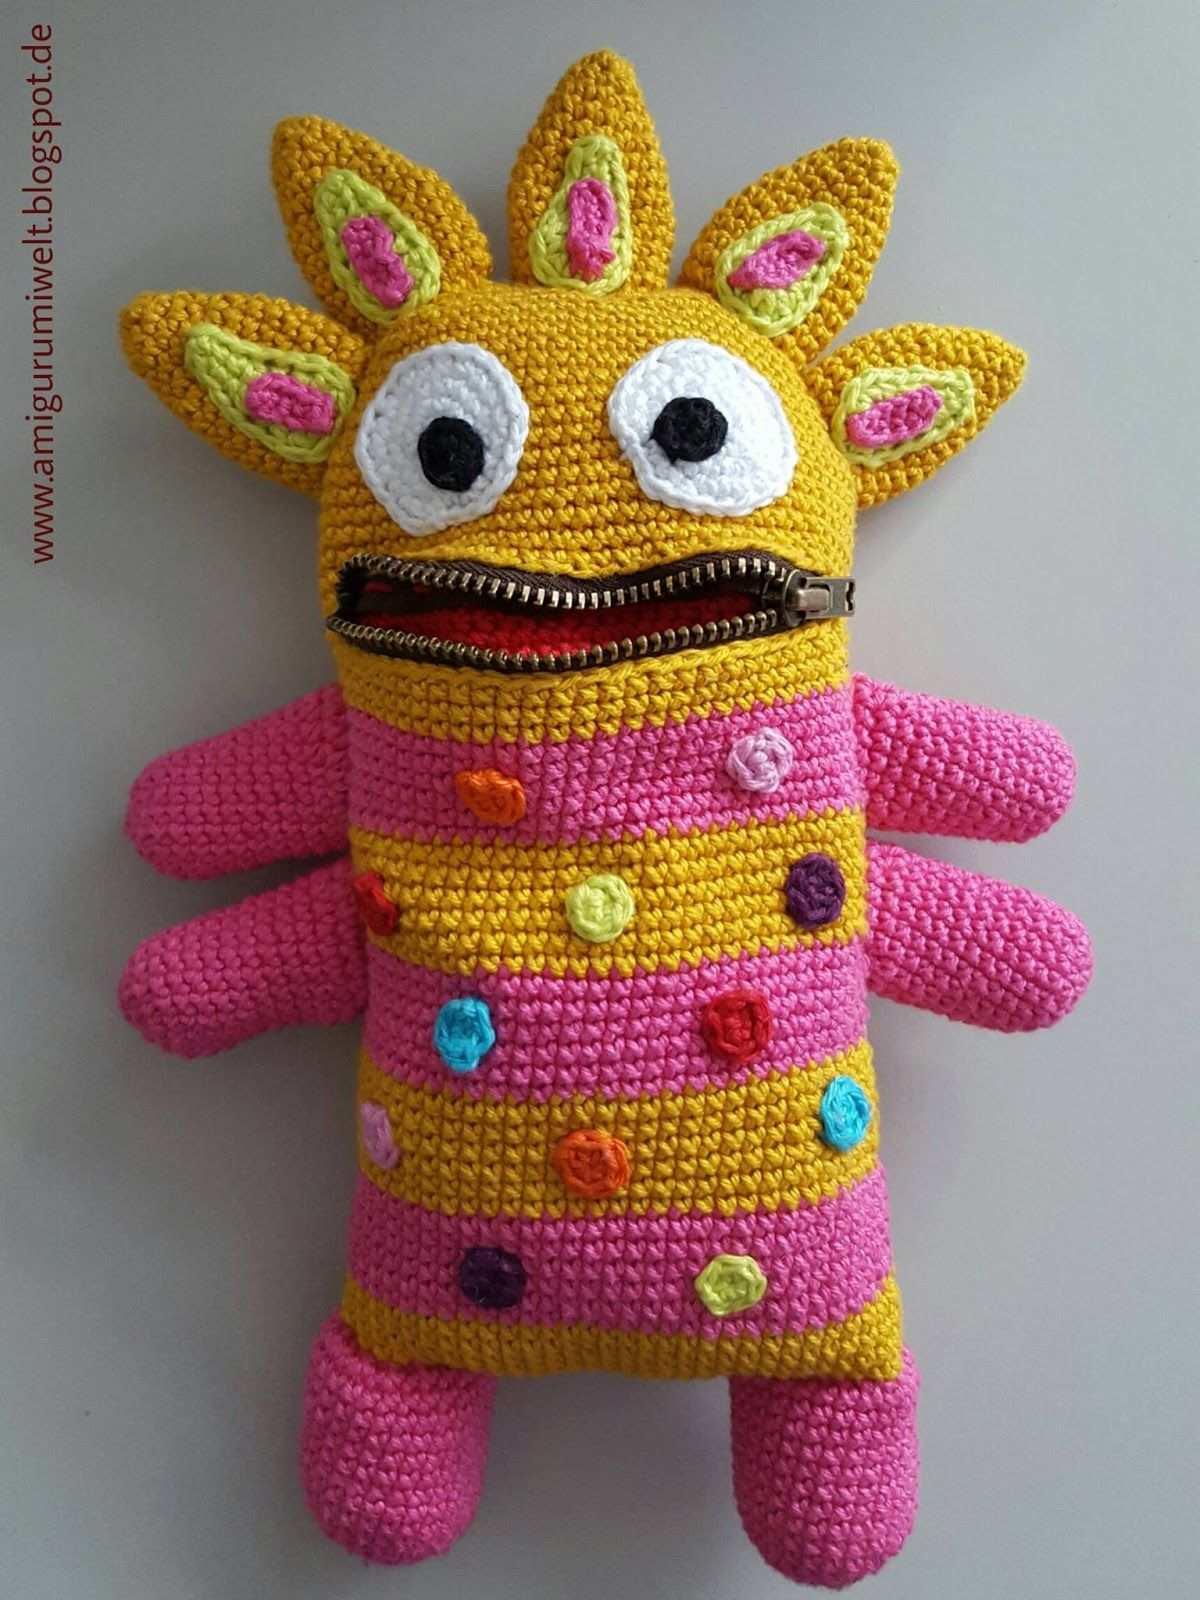 Amigurumi Hakeln Crochet Kostenlos Free Monster Monster Hakeln Tiere Hakeln Anleitung Kostenlos Deutsch Tiere Hakeln Anleitung Kostenlos